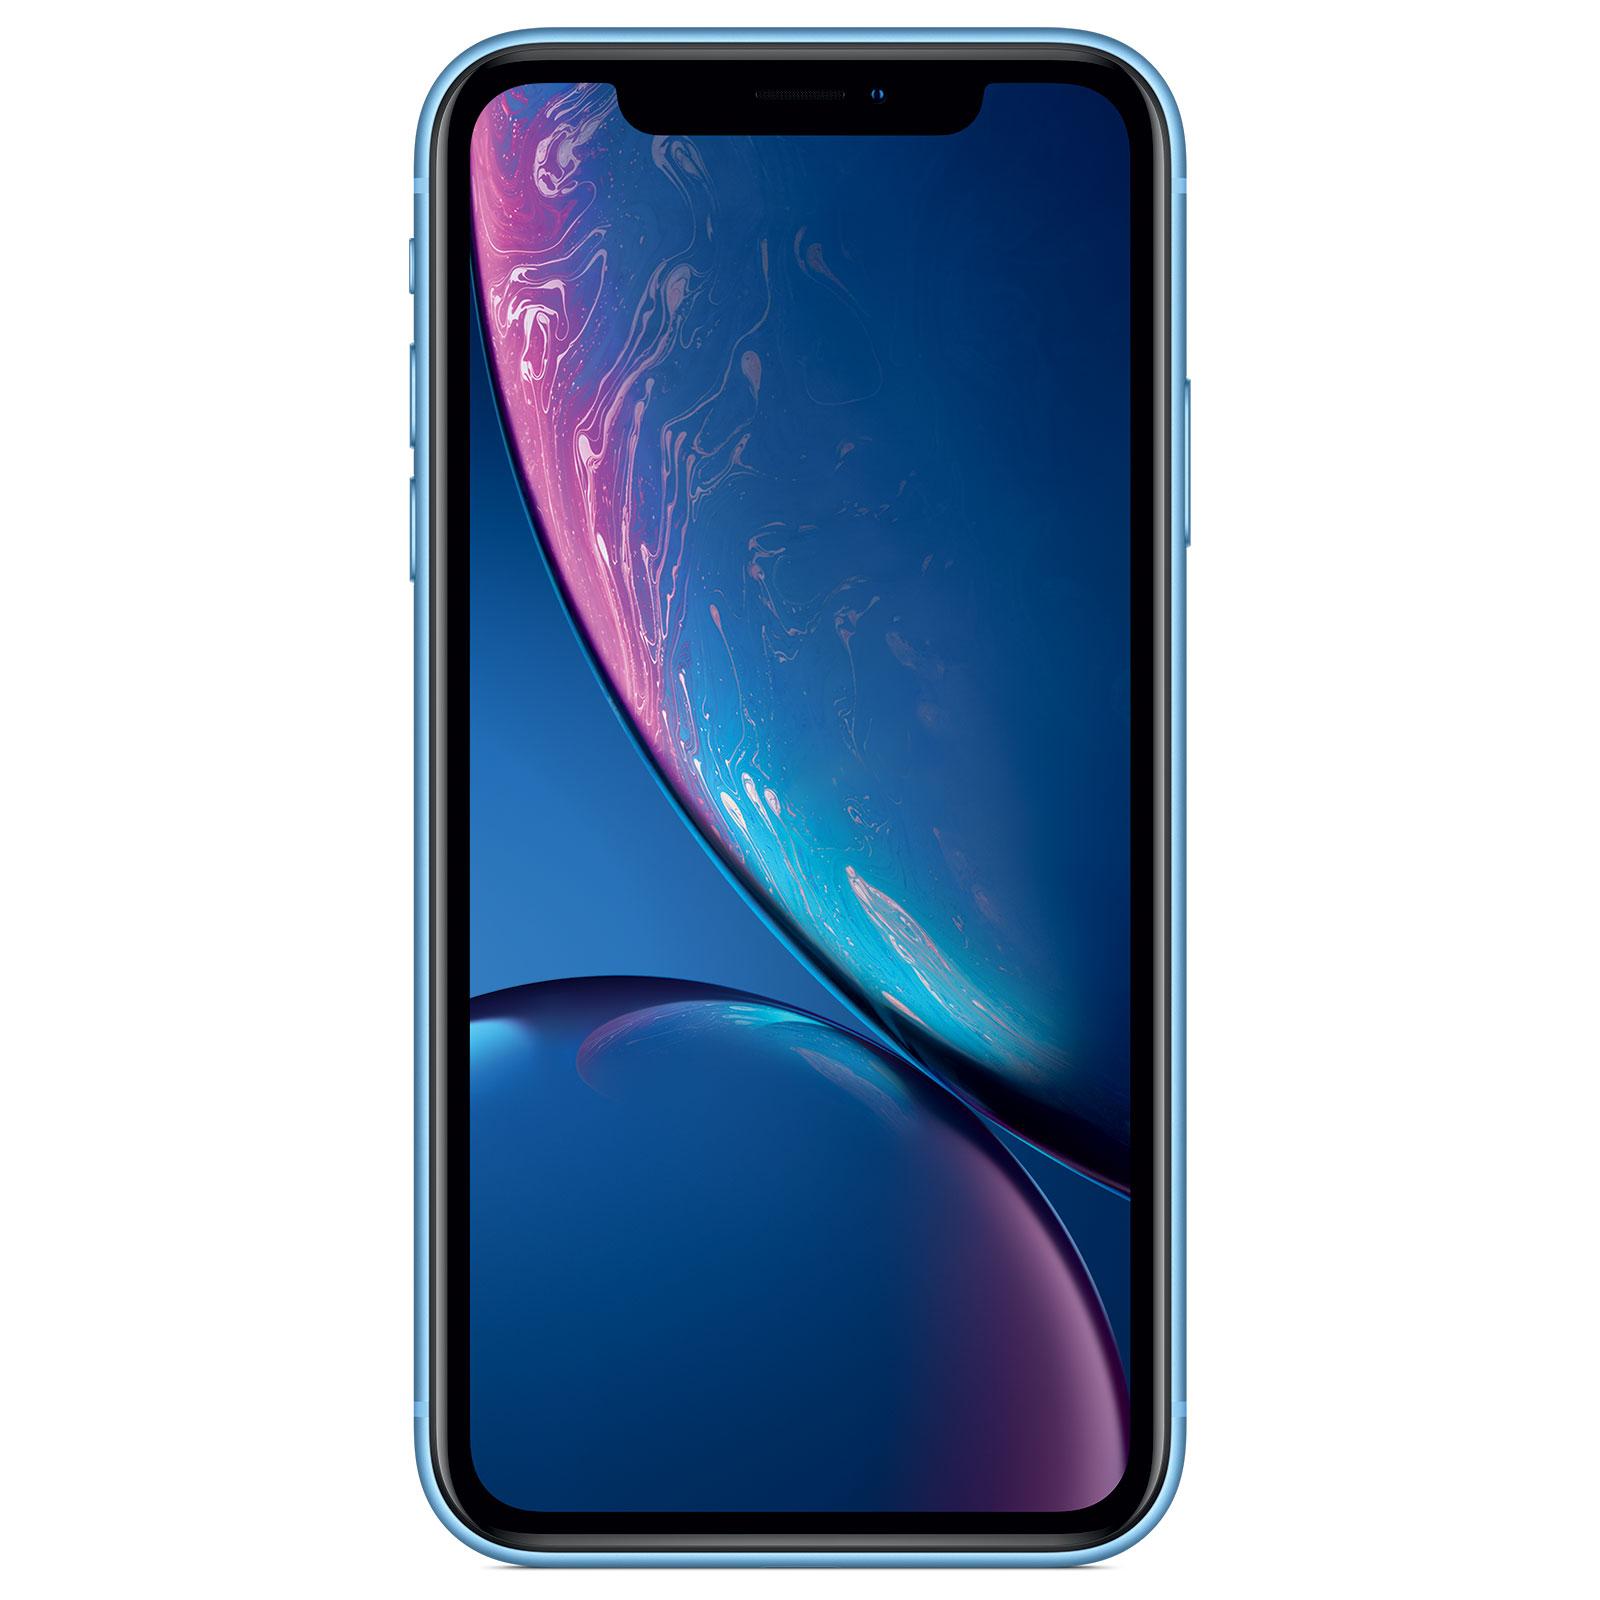 Apple IPhone XR 256 Go Bleu Smartphone 4G LTE Advanced IP67 Dual SIM